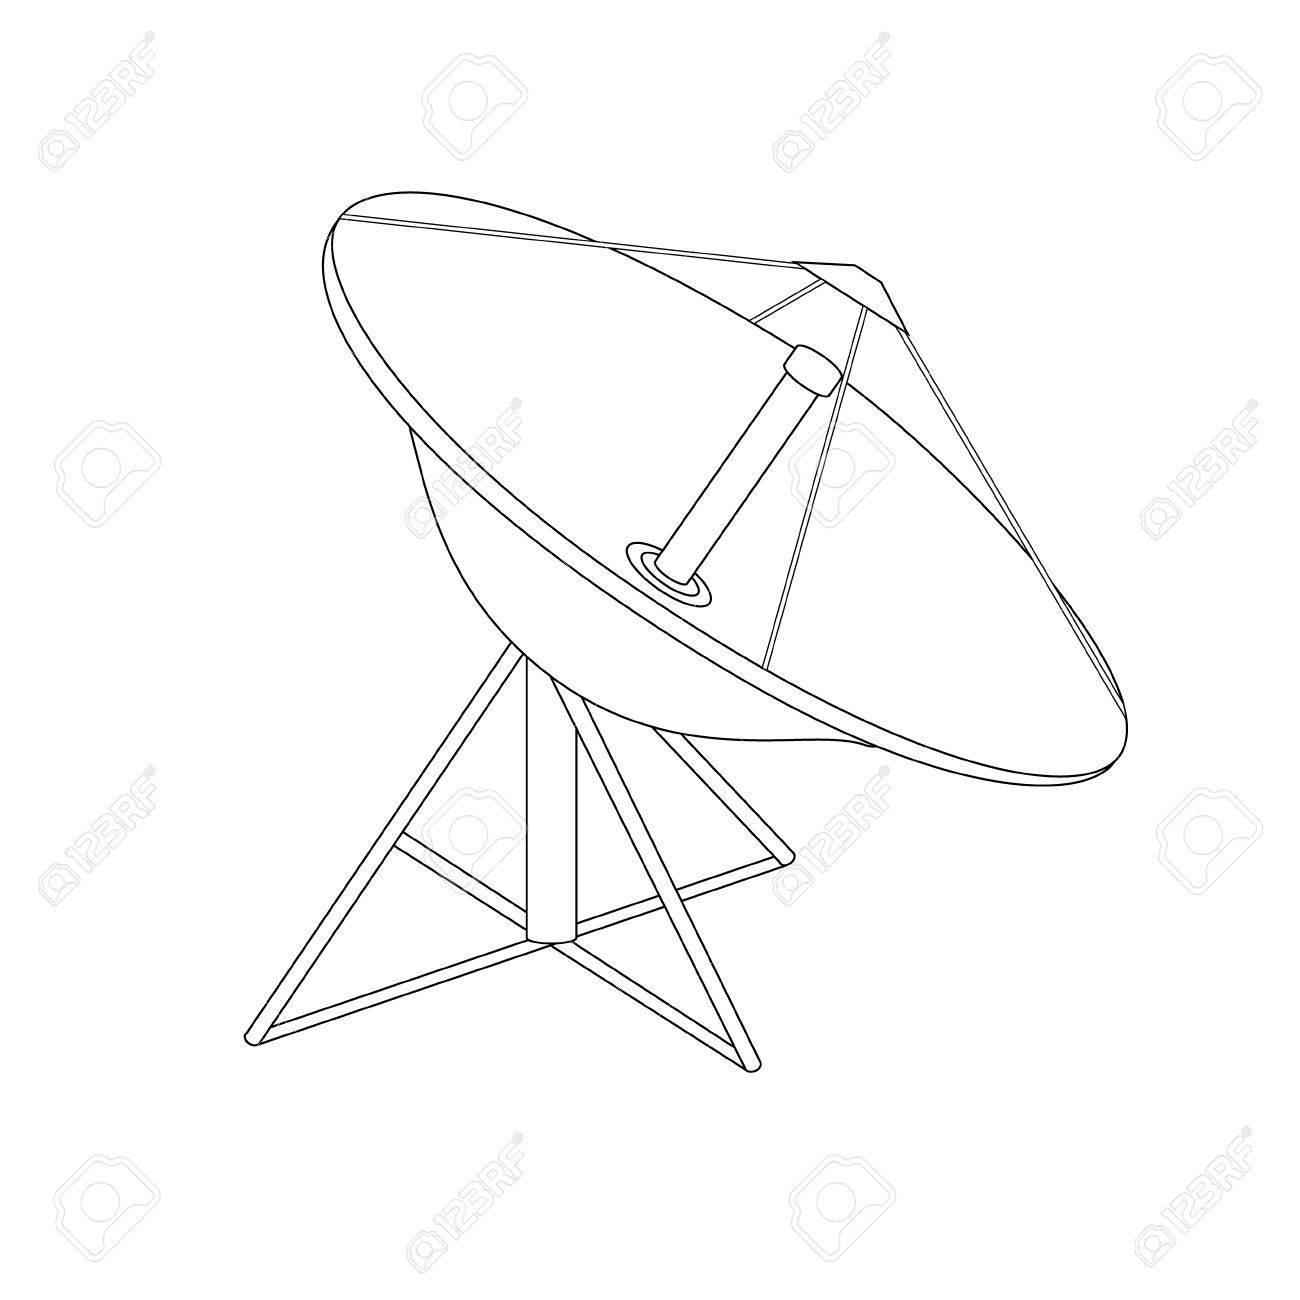 hight resolution of 1300x1300 raster illustration satellite dish antenna outline drawing radar